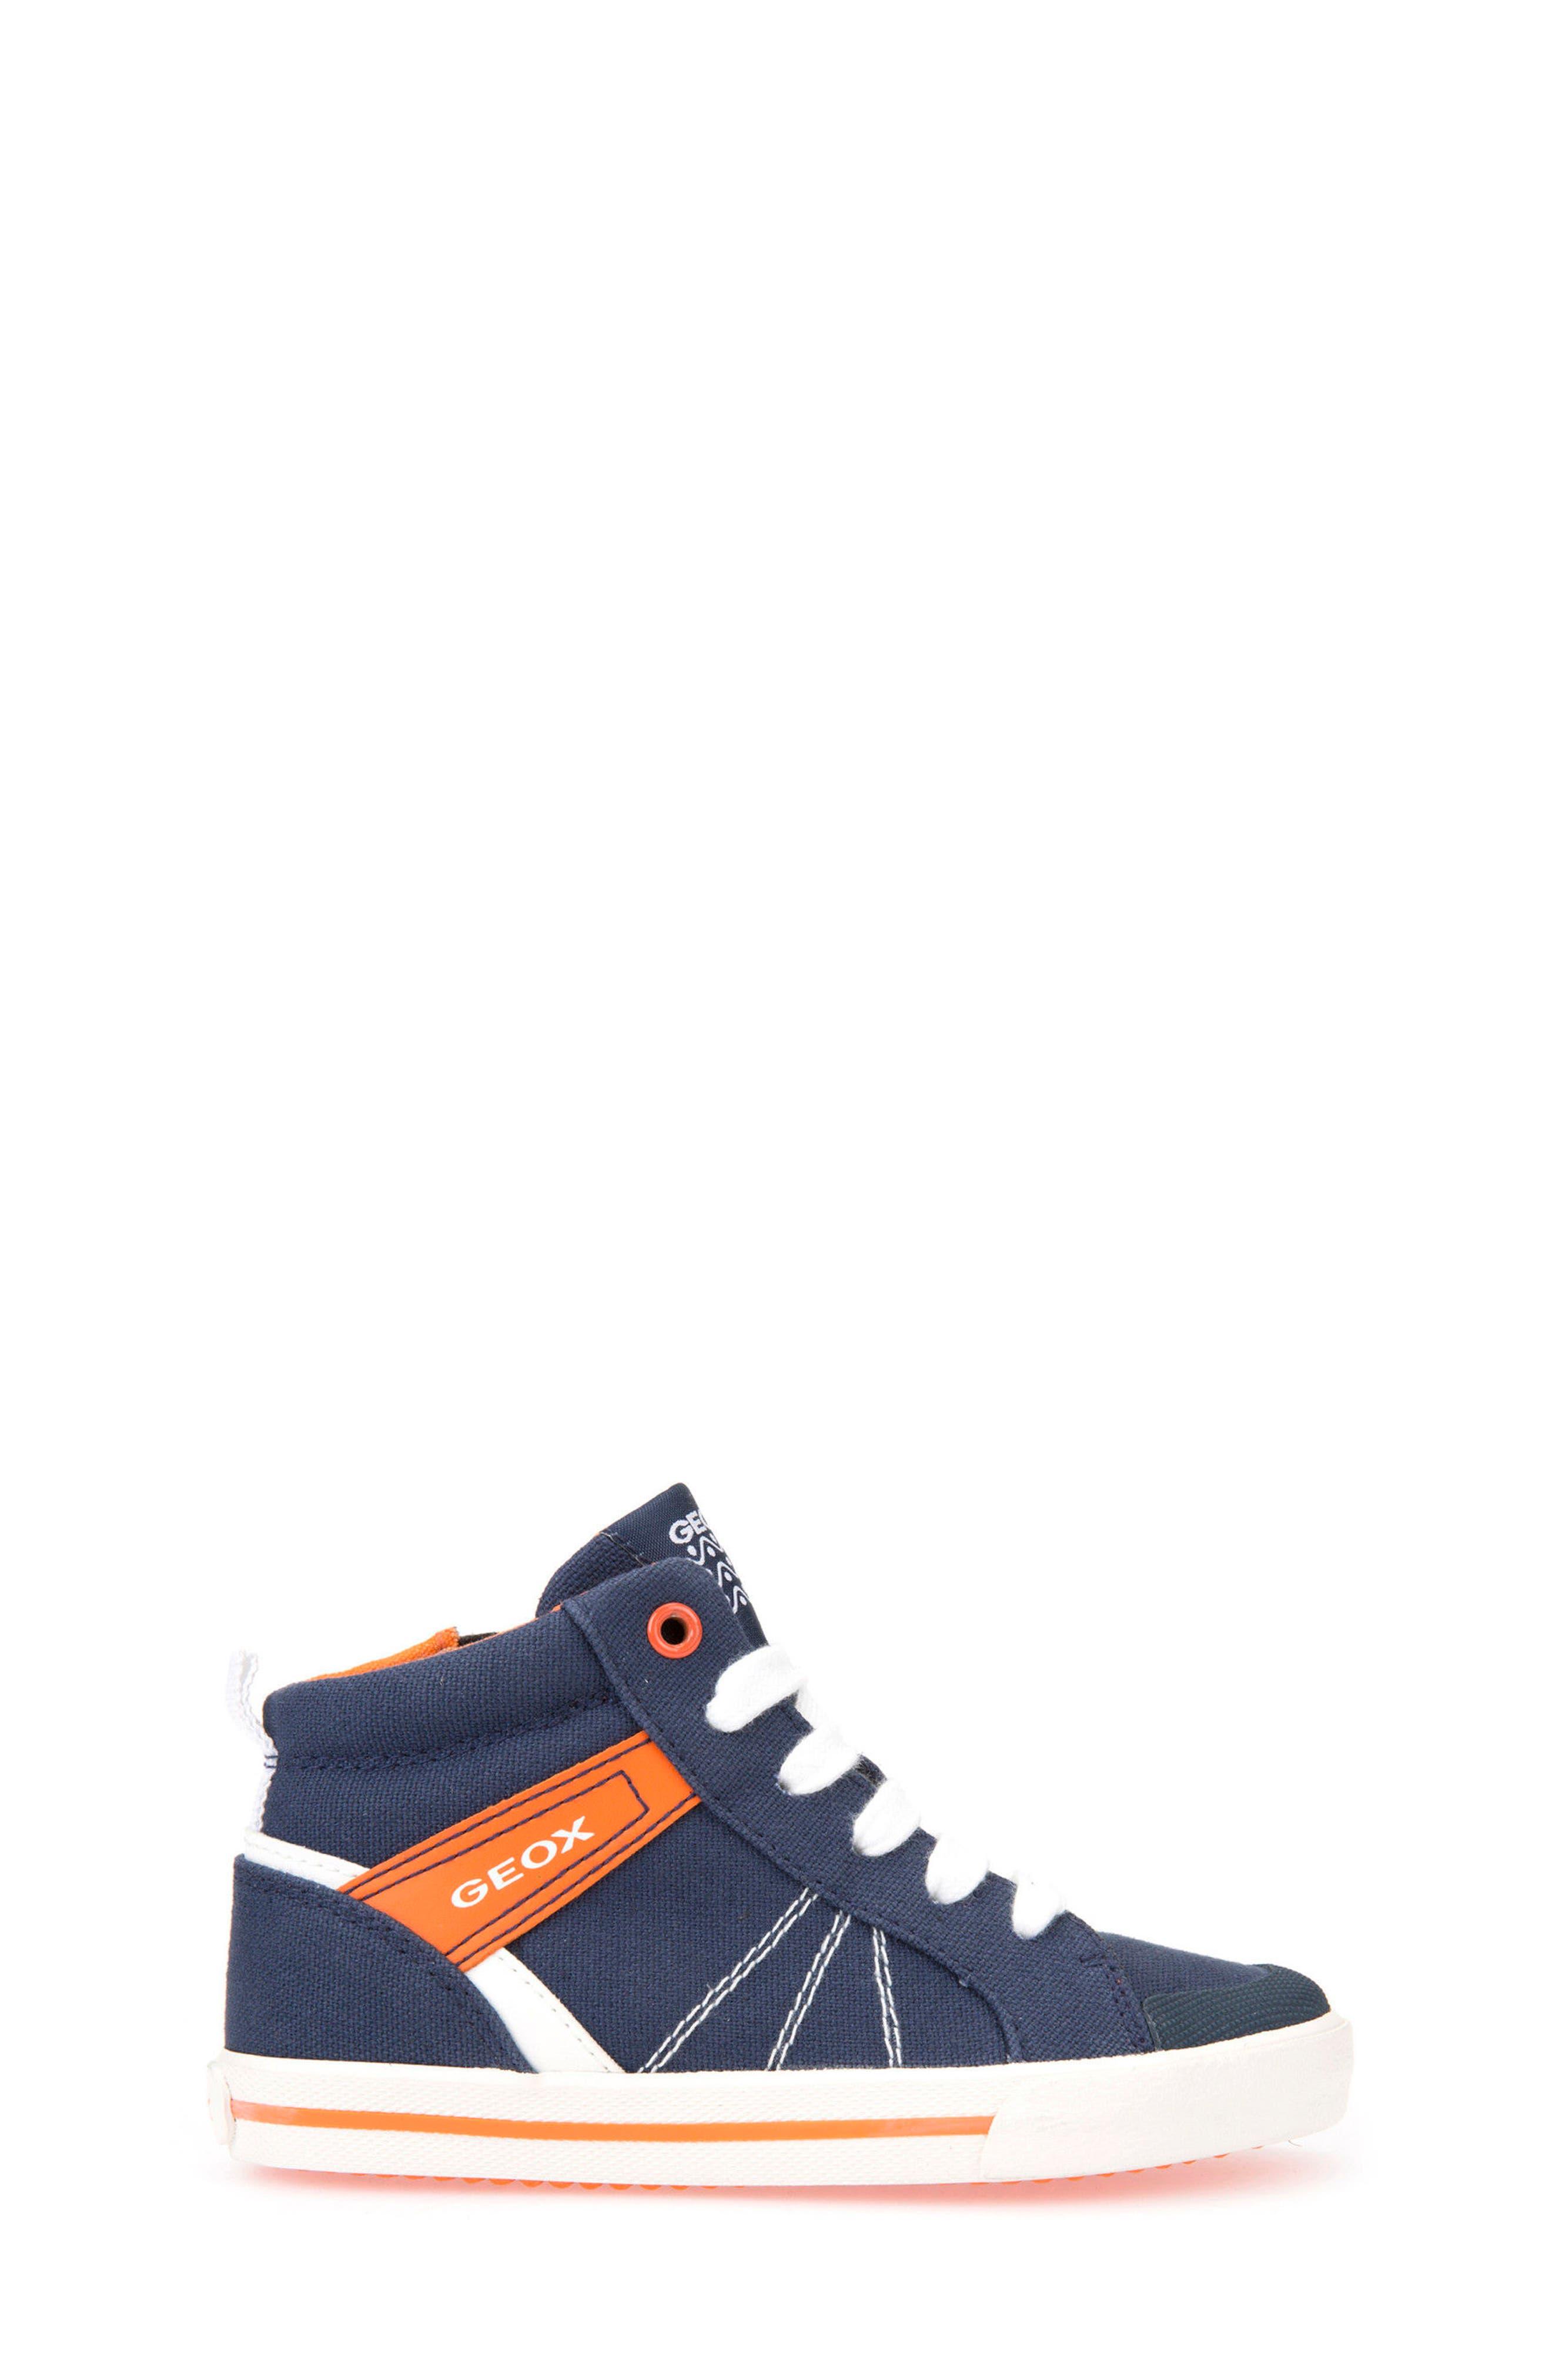 Kilwi Zip High Top Sneaker,                             Alternate thumbnail 3, color,                             402